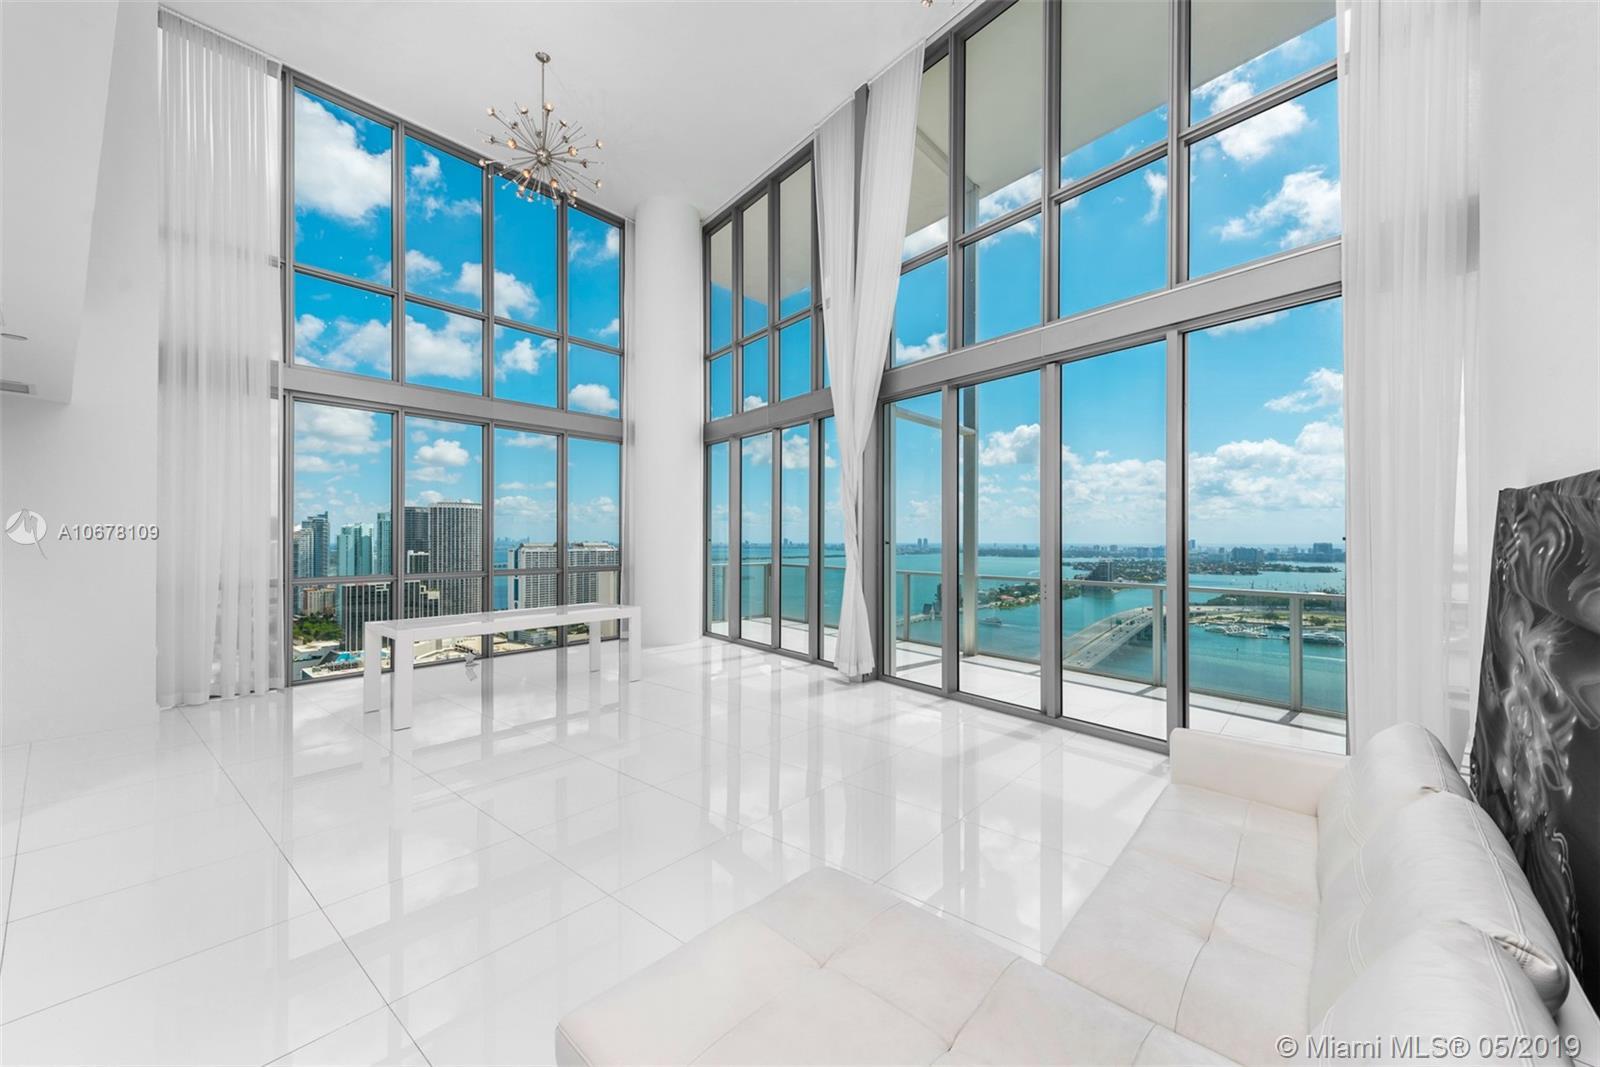 1100 Biscayne Miami, FL 33132